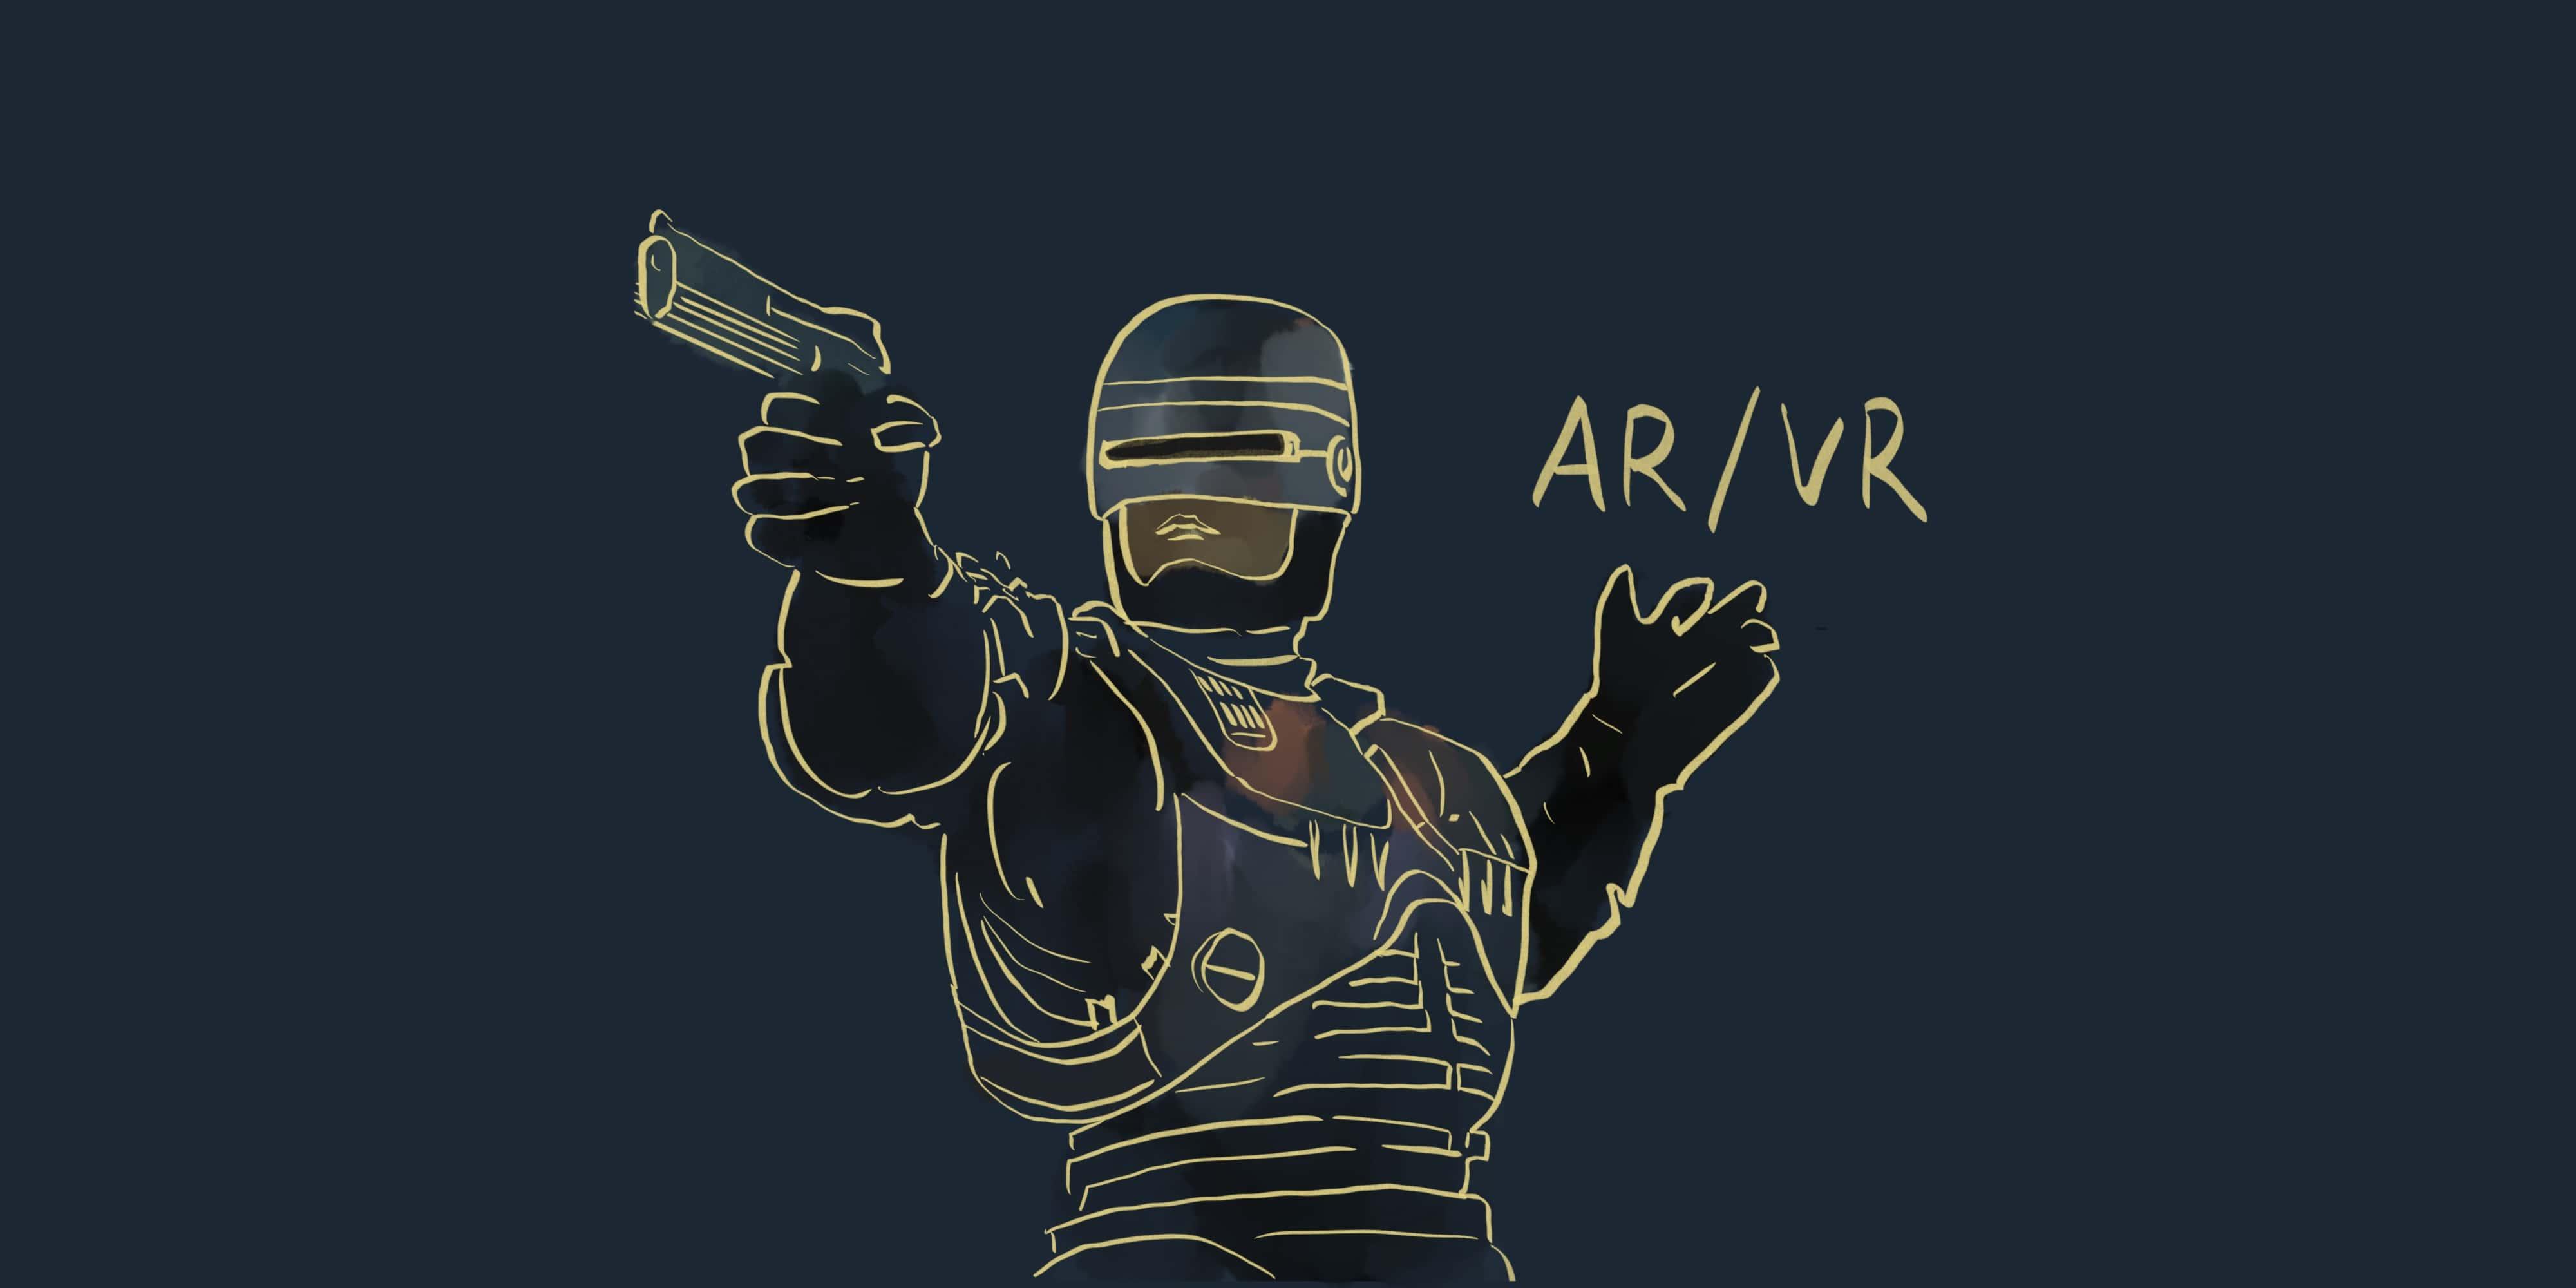 Гайд по виртуальным мирам: AR и VR